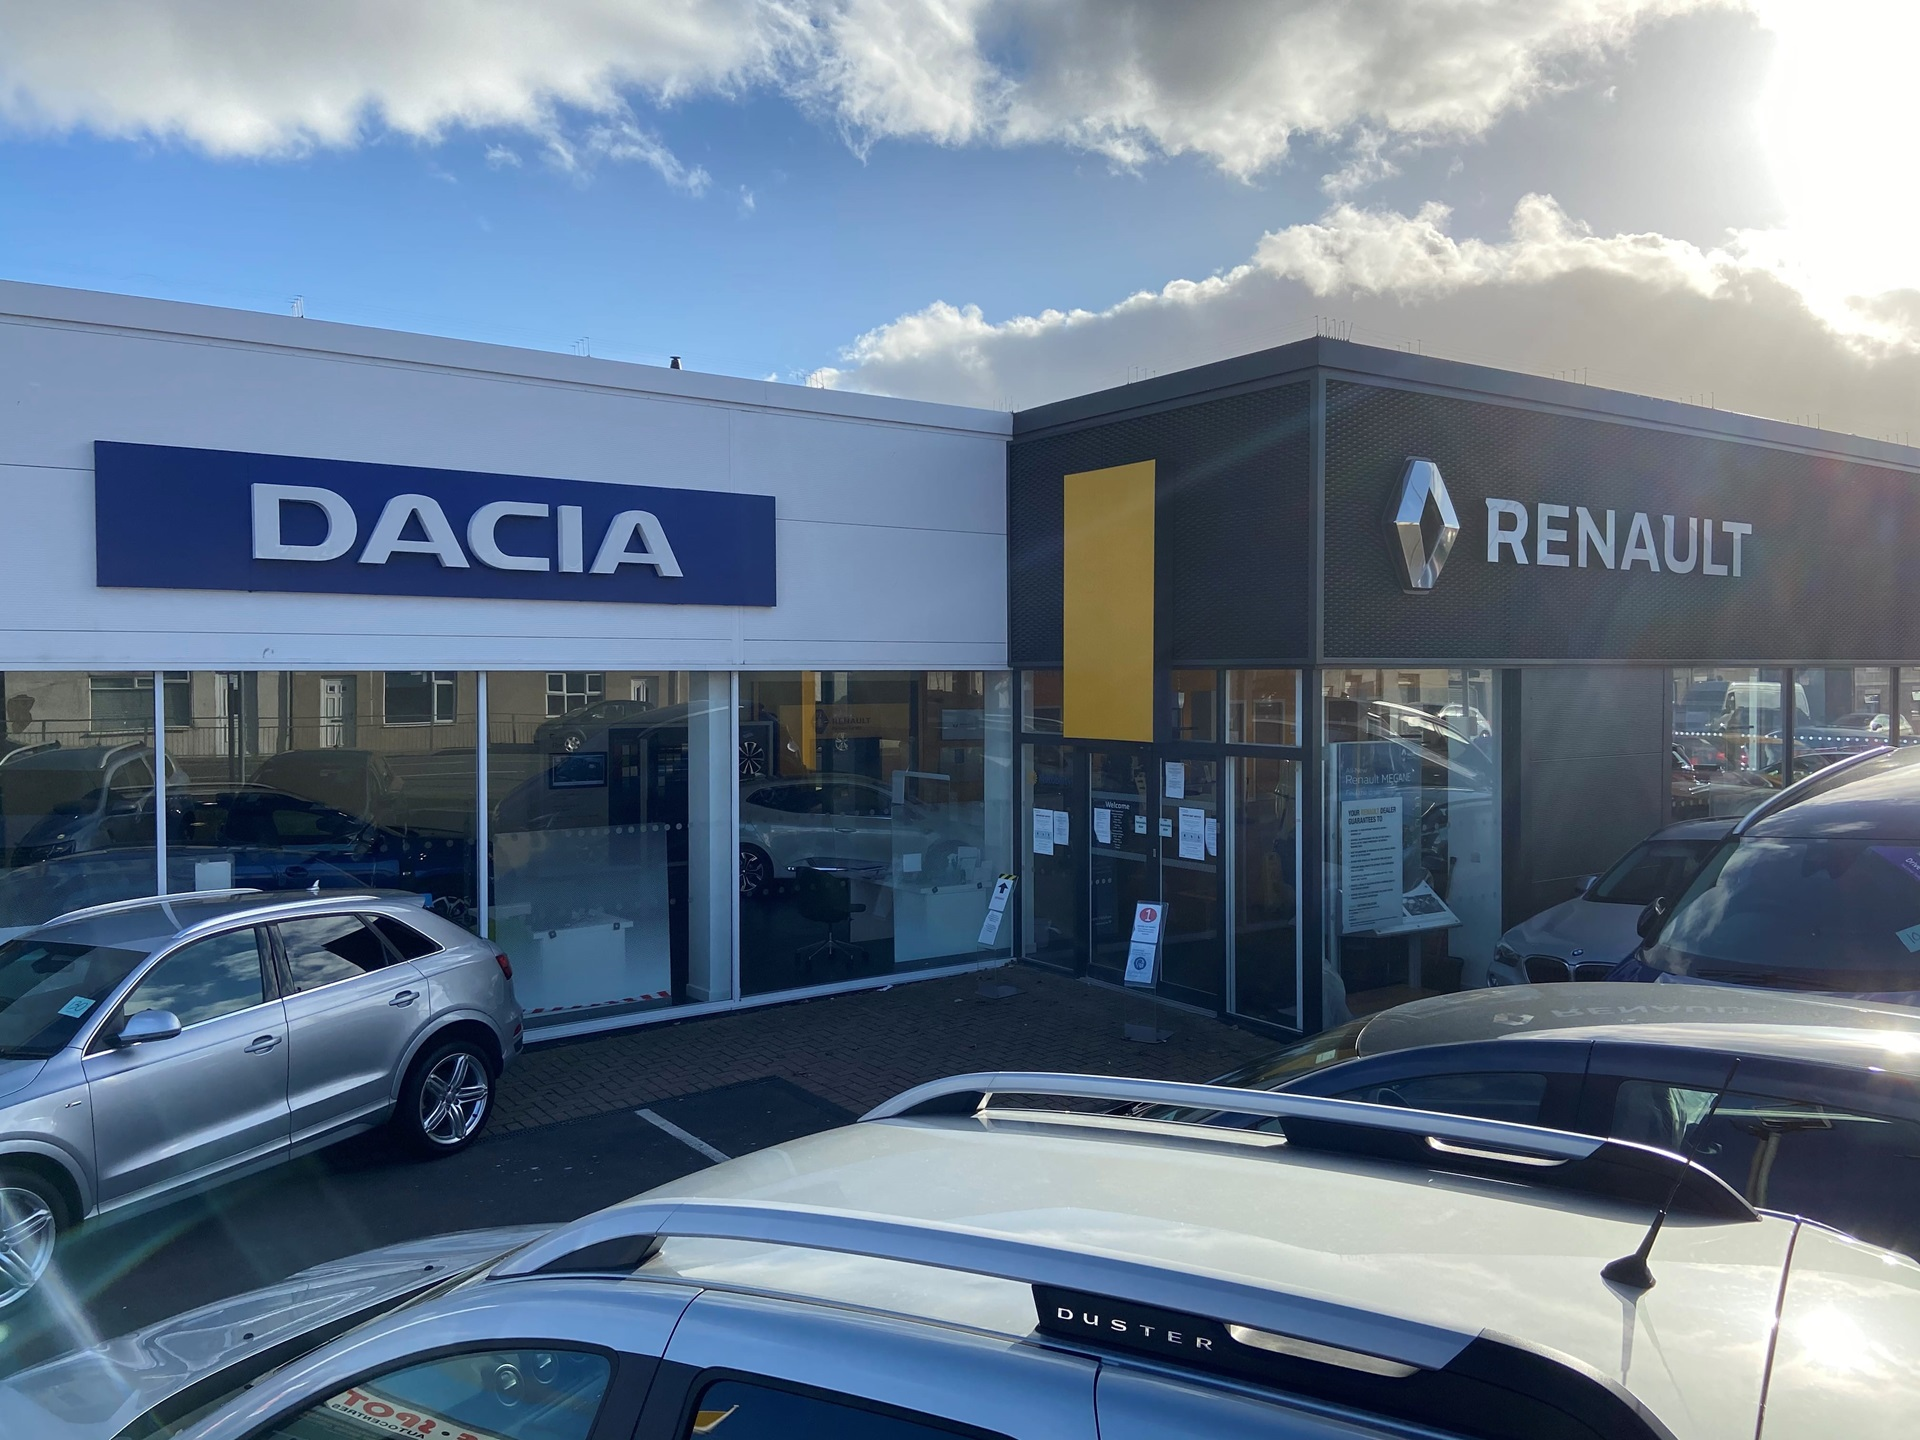 Outside Dacia Durham dealership